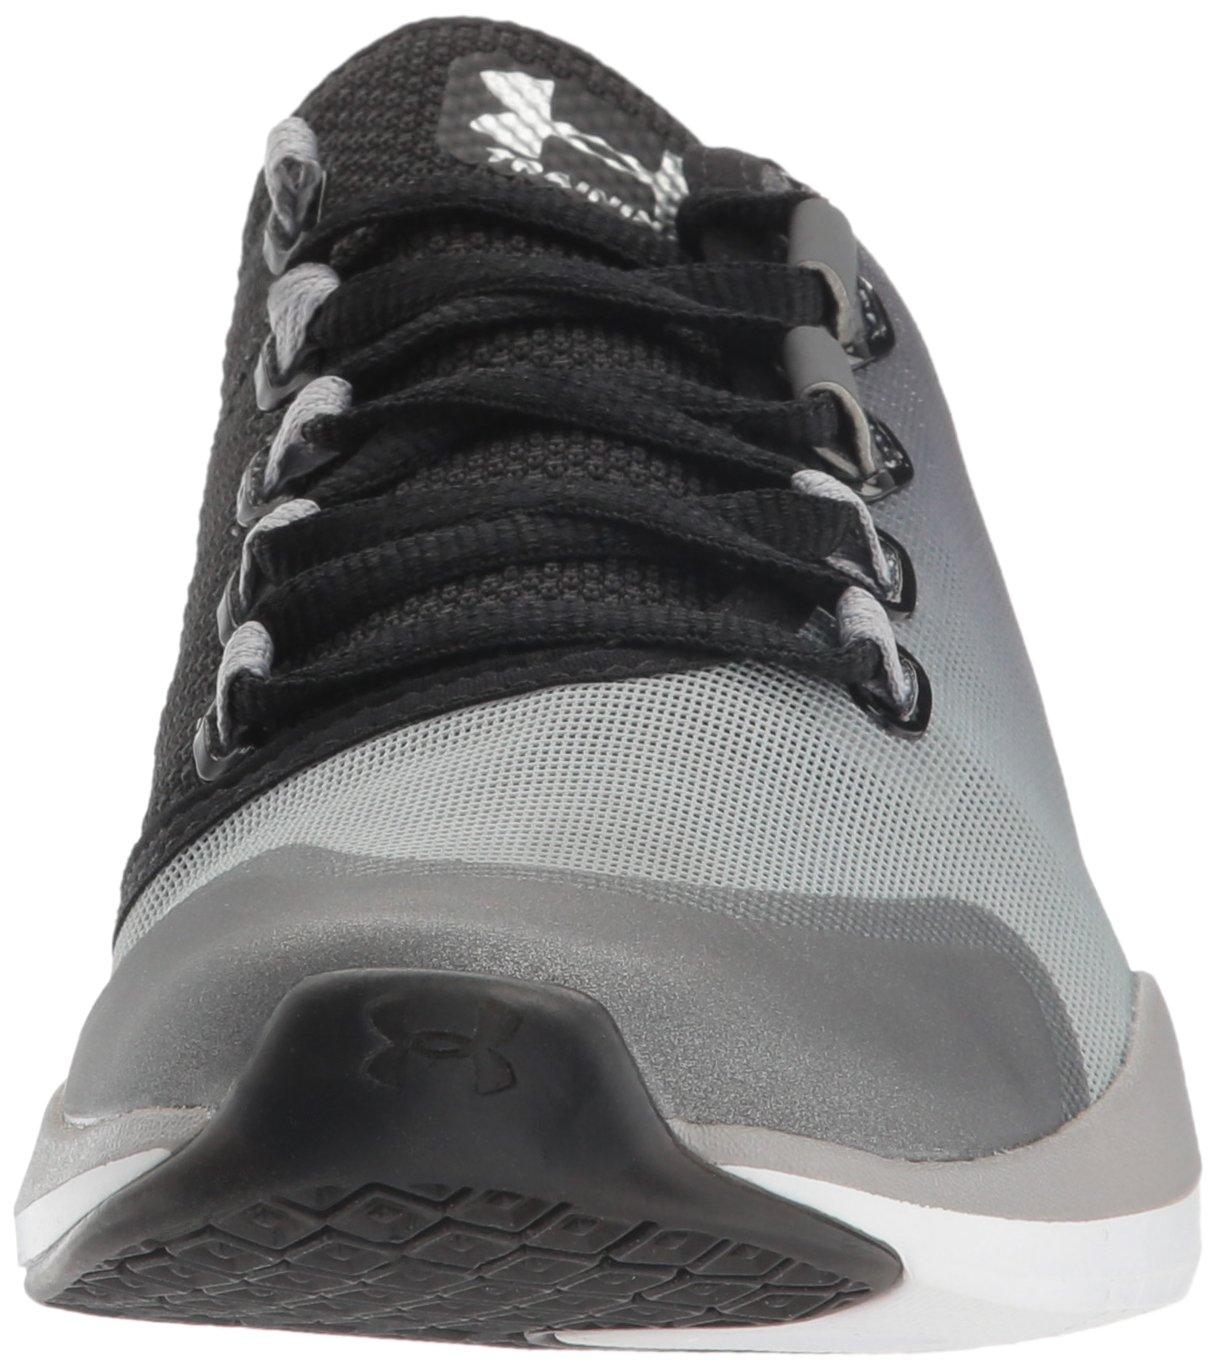 Under Armour Women's Charged Push Cross-Trainer Shoe B01GSOCTLO 10 M US|Rhino Gray (076)/Black